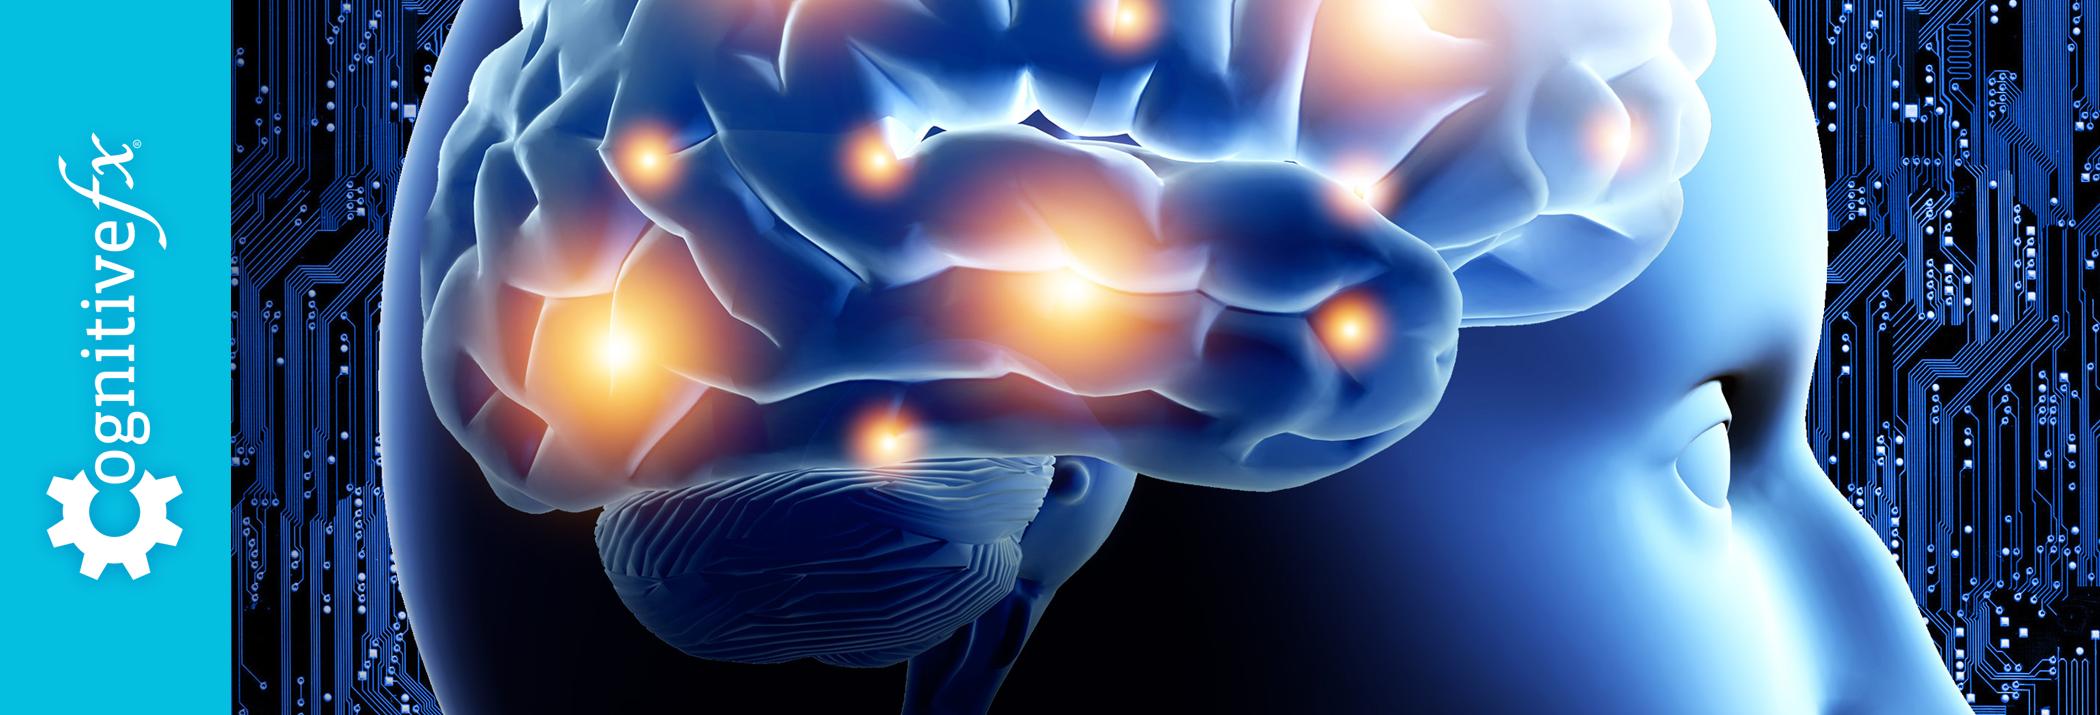 What is EPIC Concussion Treatment?